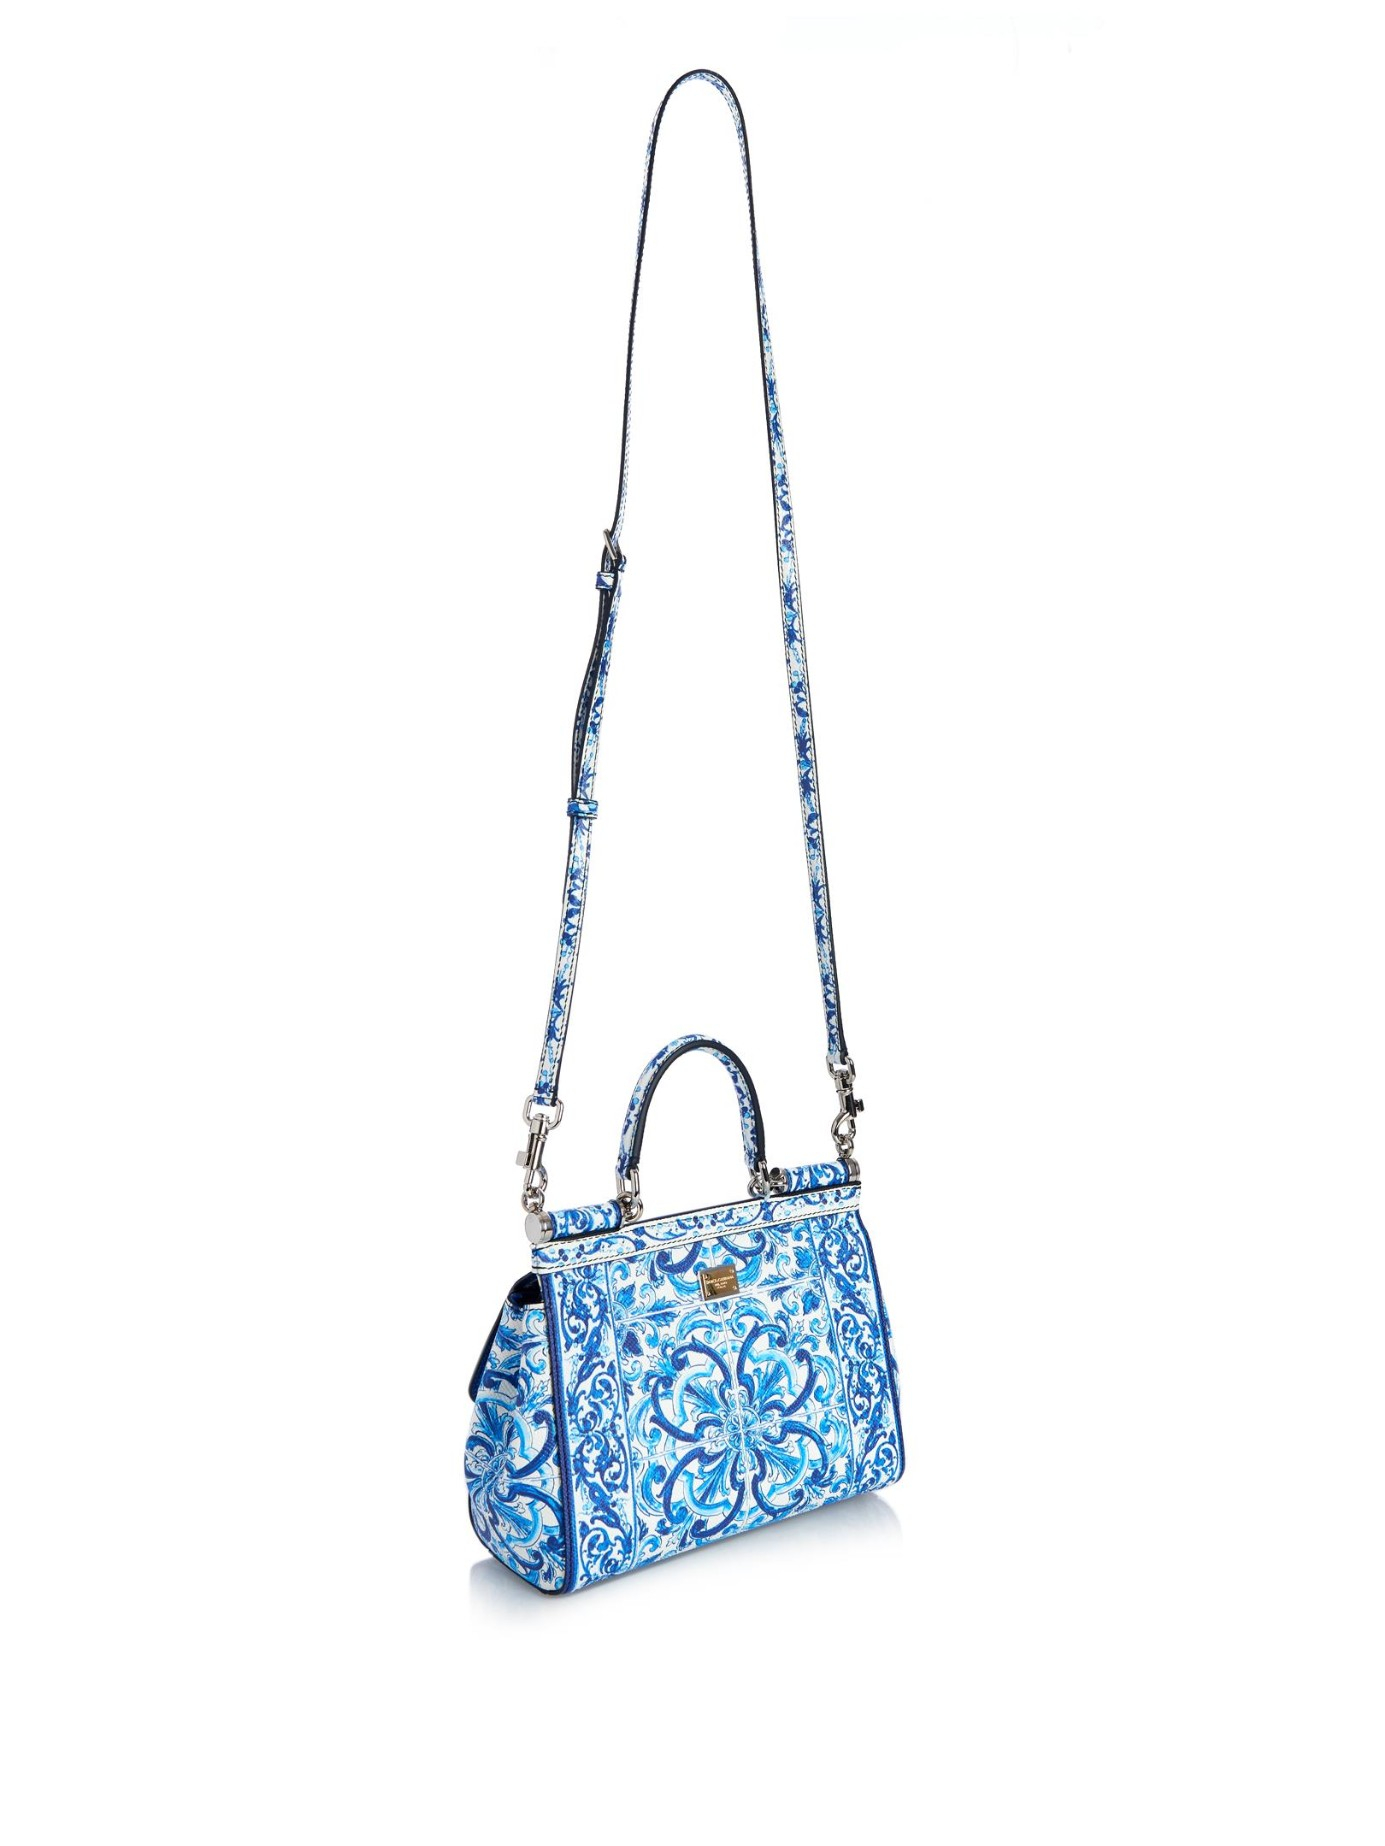 852231eacc Lyst - Dolce   Gabbana Mini Sicily Majolica-Print Leather Cross-Body ...